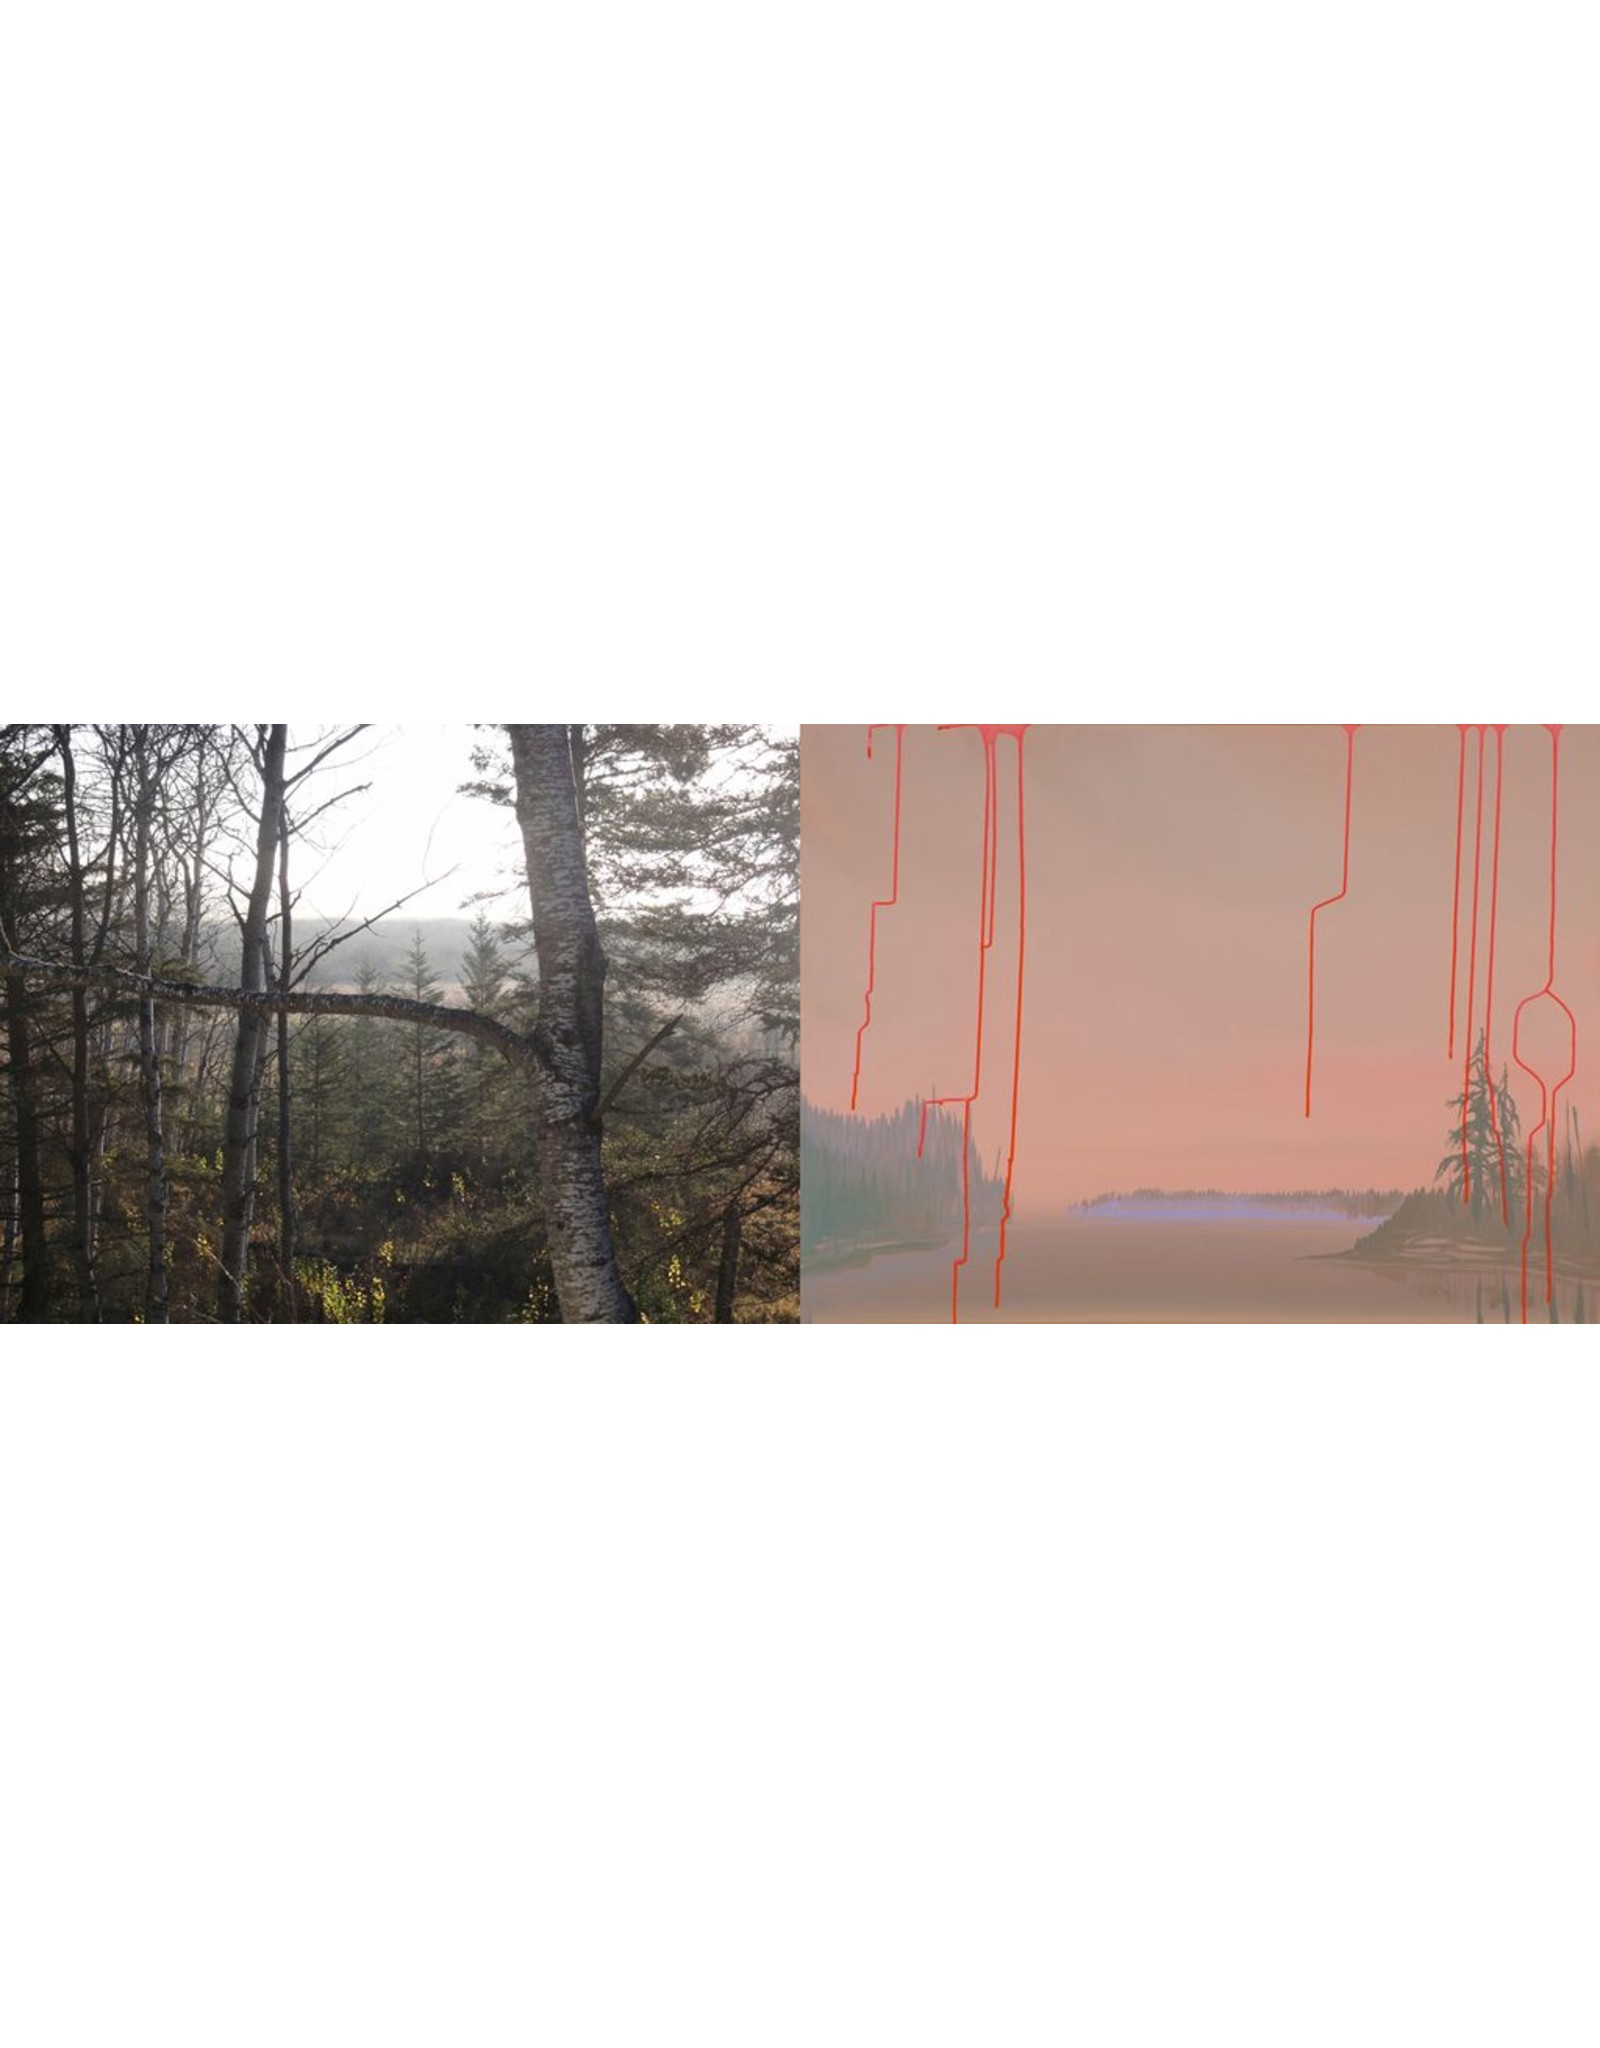 Koop, Wanda Interplay-Gravity